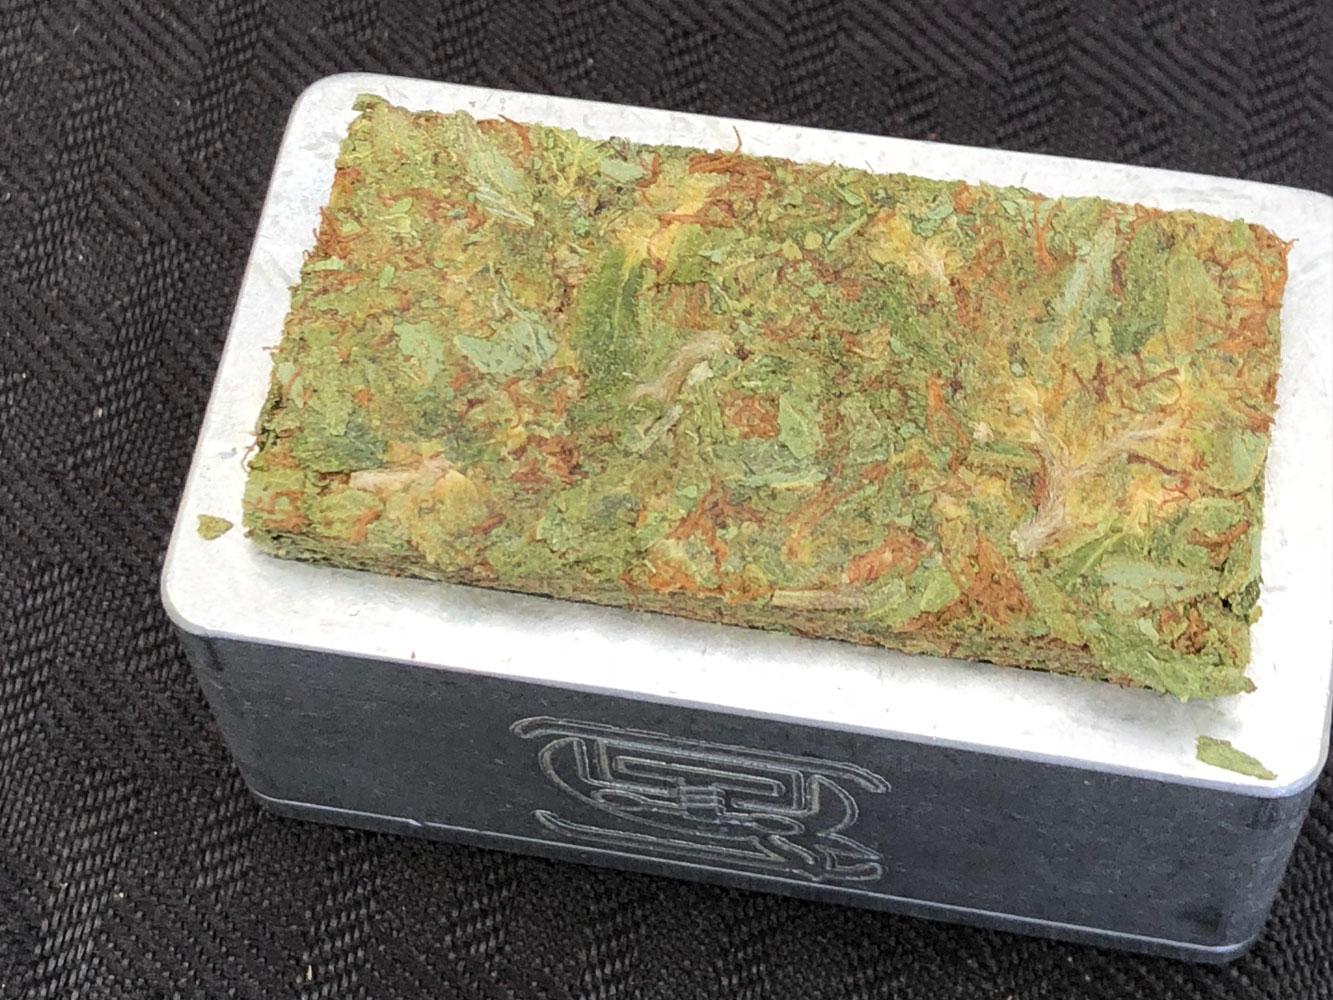 CBD Flower Rosin - prepped hemp buds